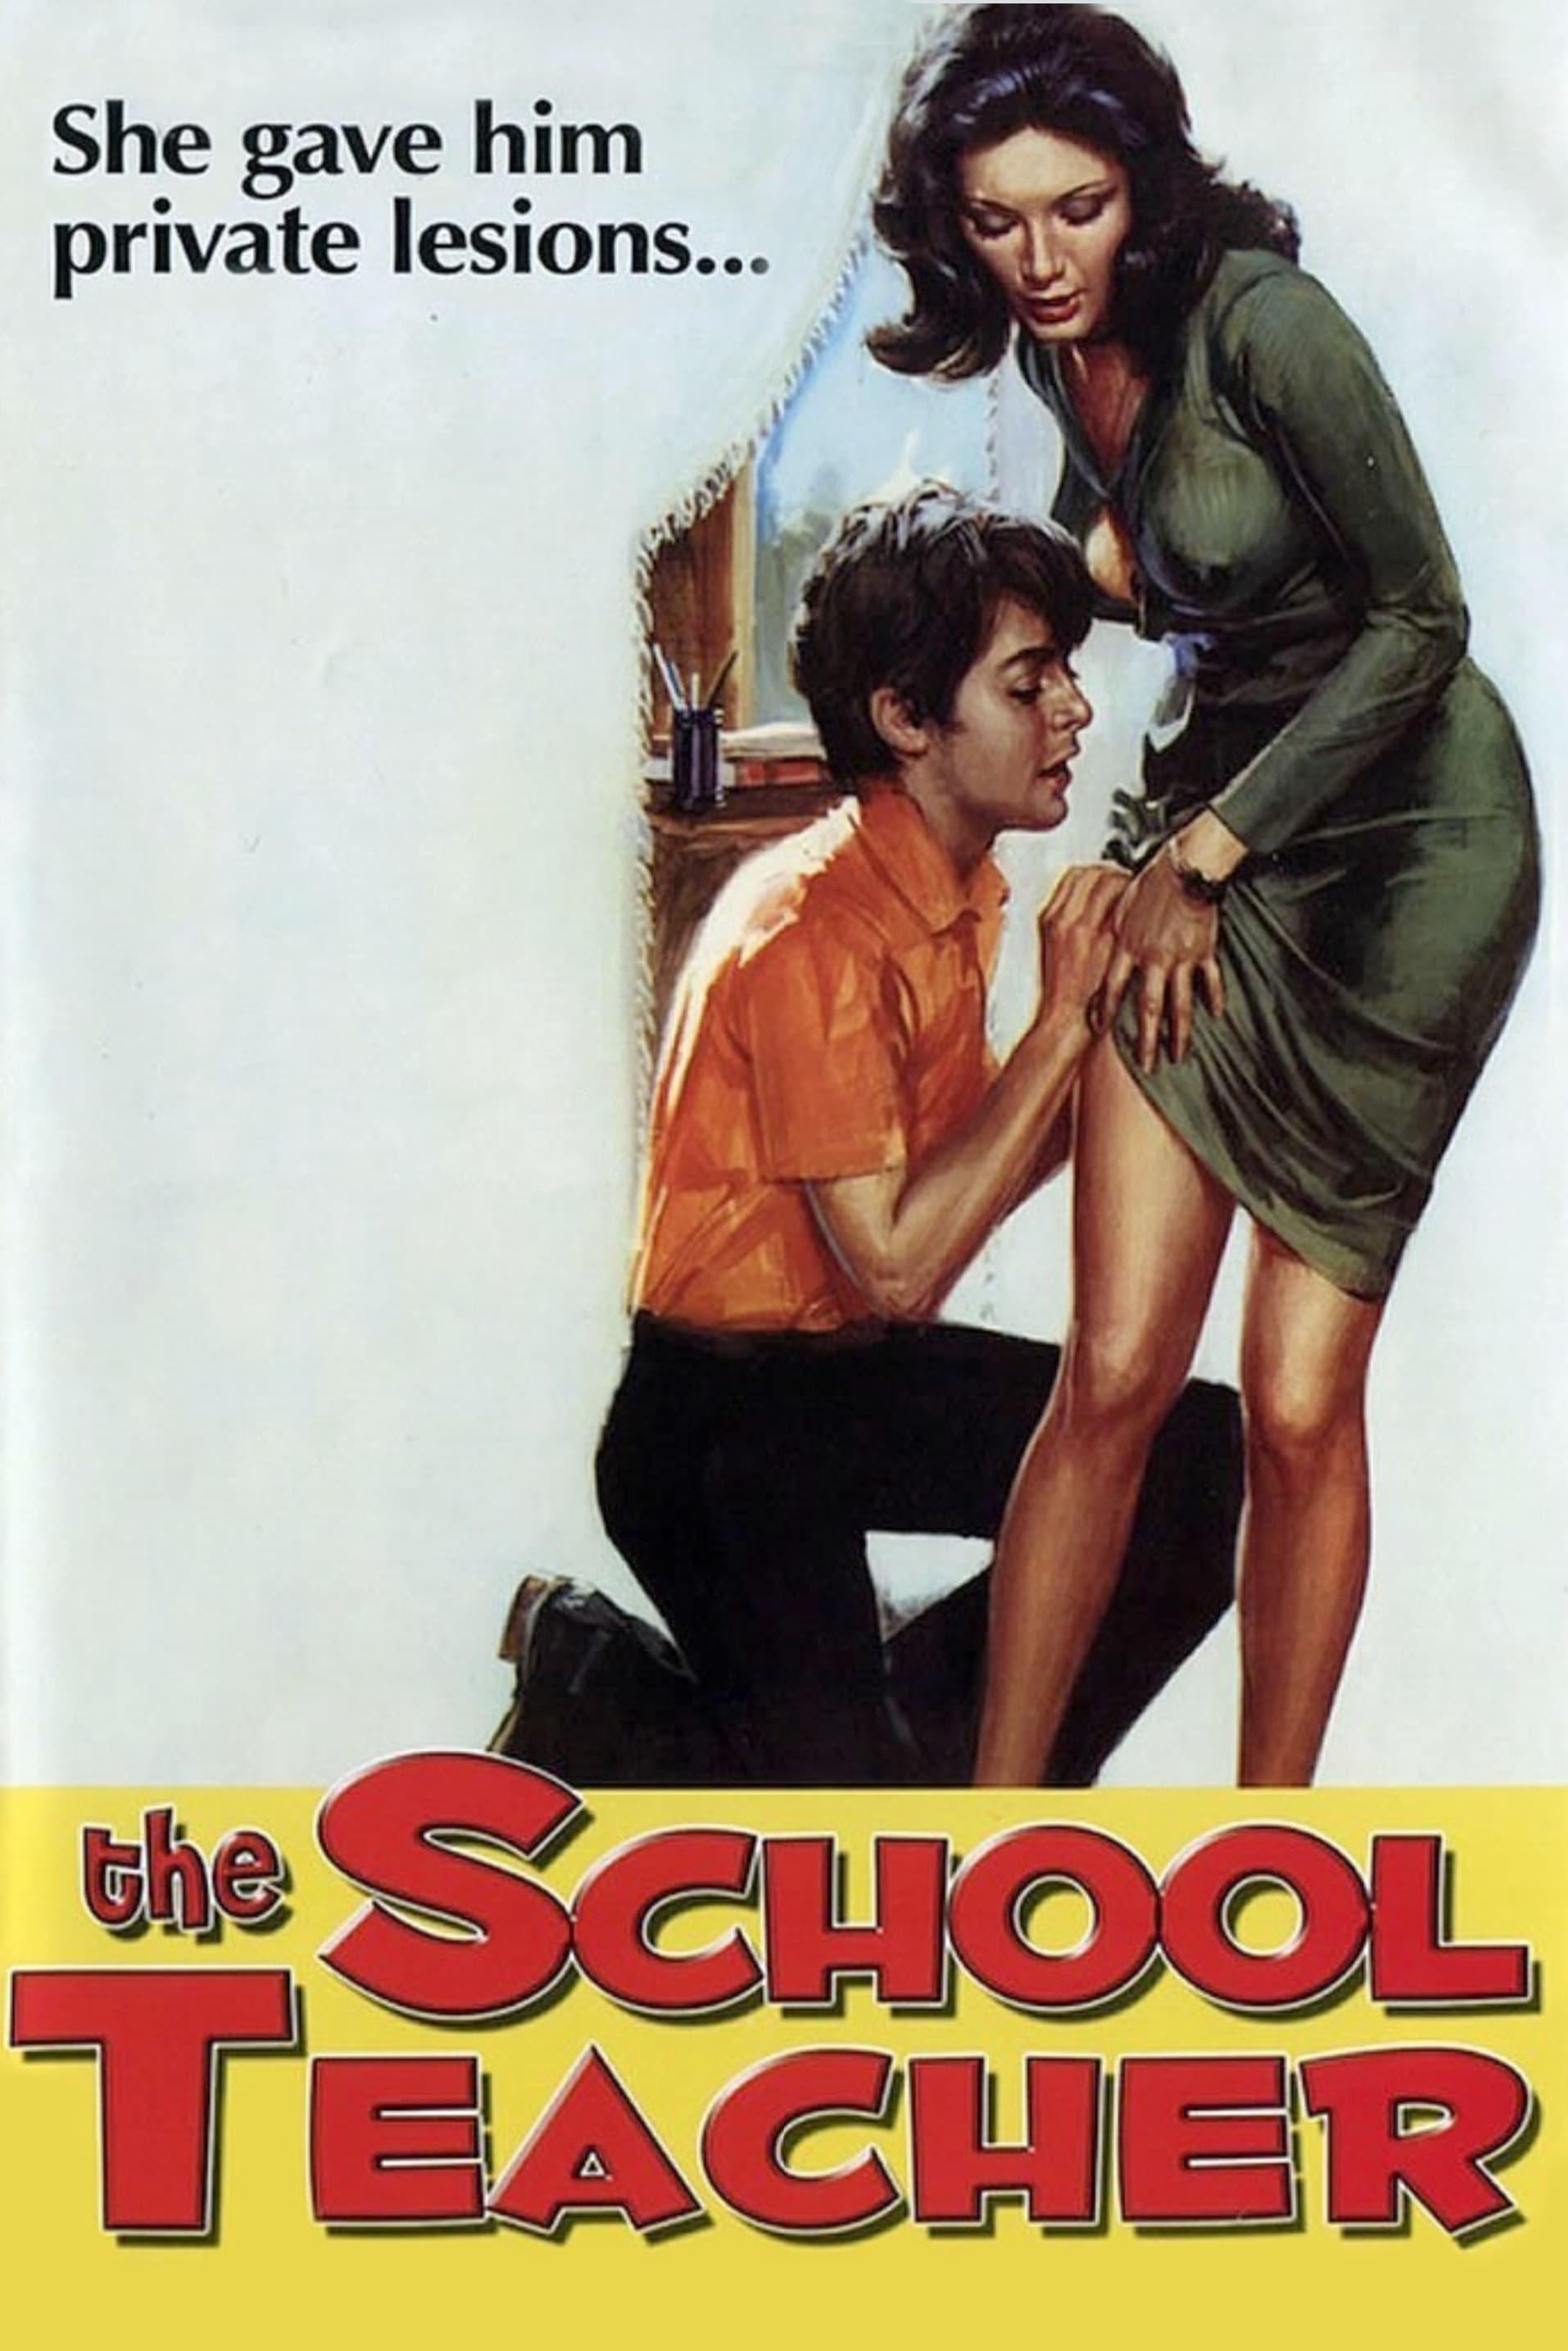 The School Teacher